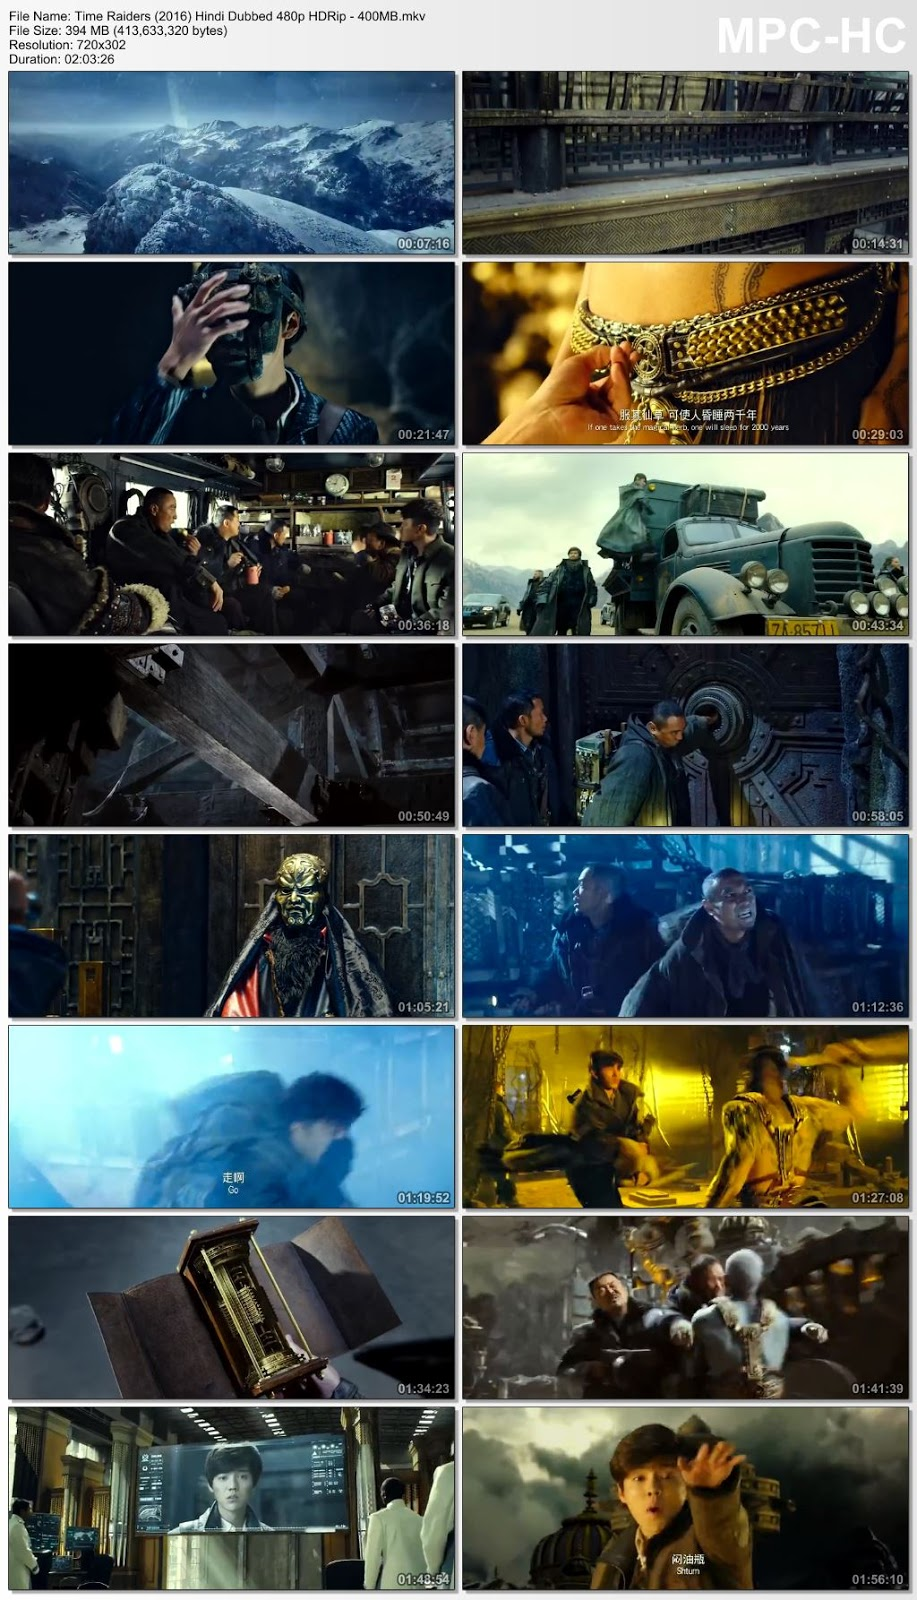 Time Raiders (2016) Hindi Dubbed 480p HDRip –  400MB Desirehub